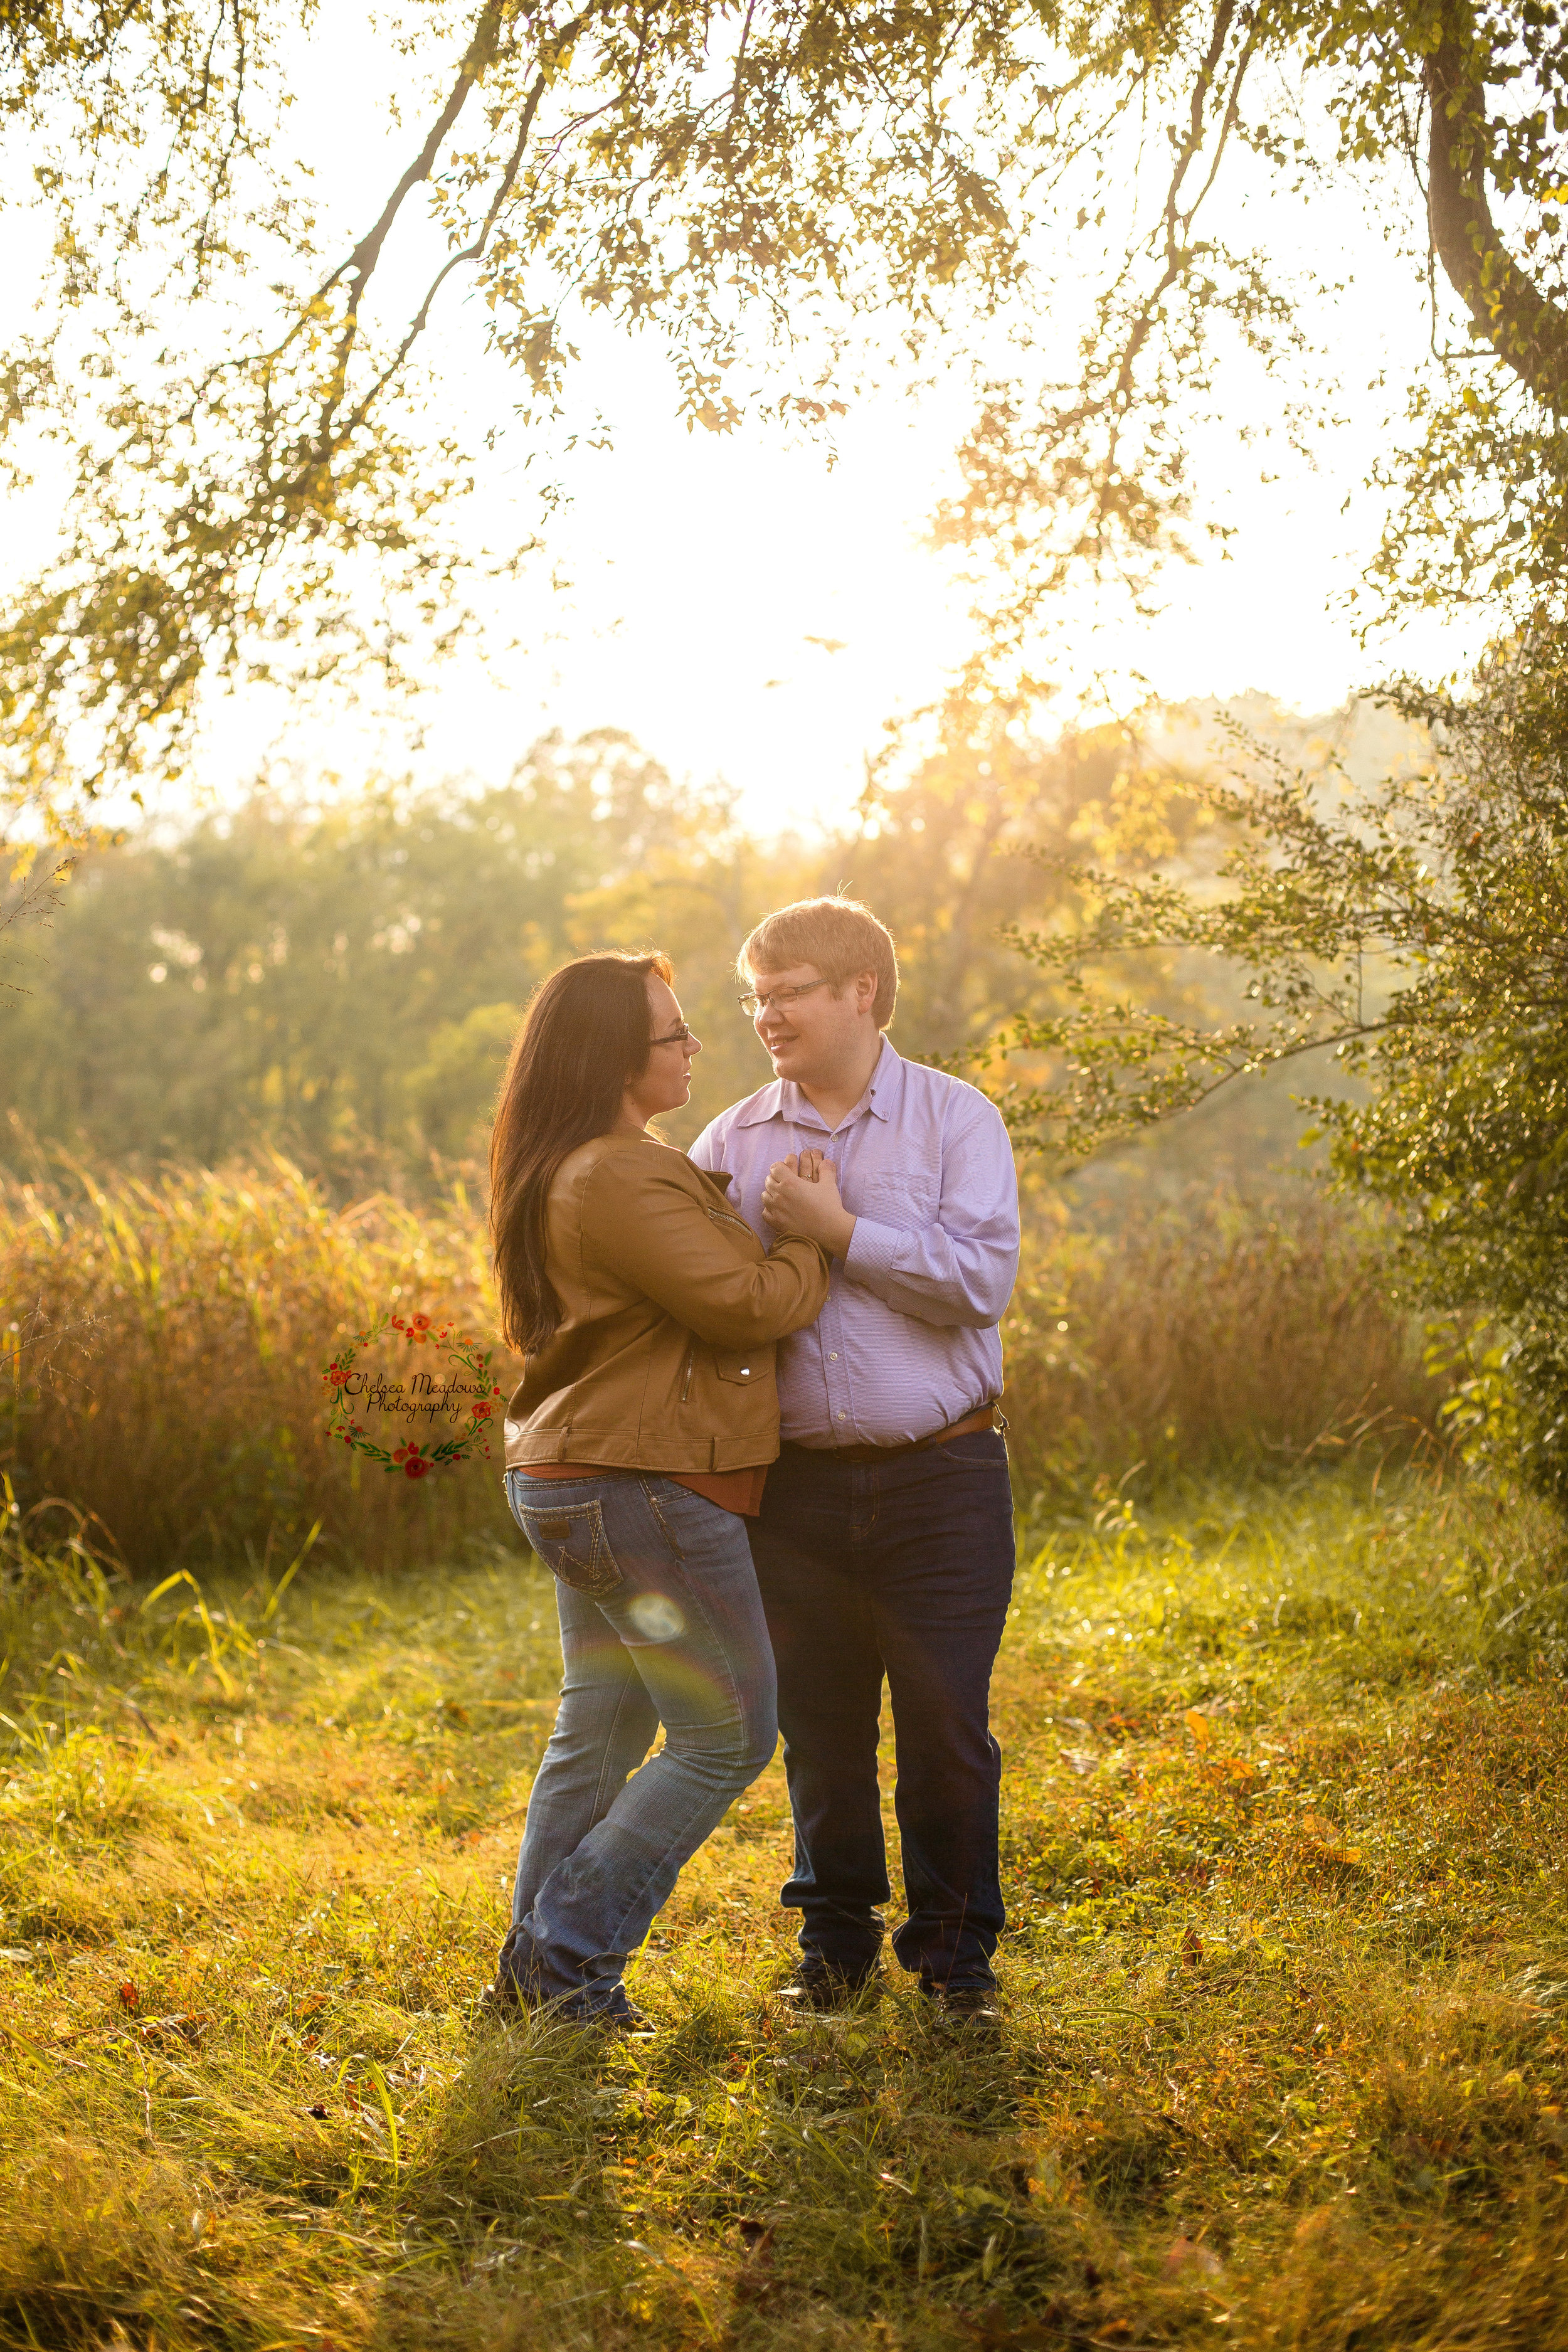 Ashley & Alex Engagement Session - Nashville Couple Photographer - Chelsea Meadows Photography (49).jpg